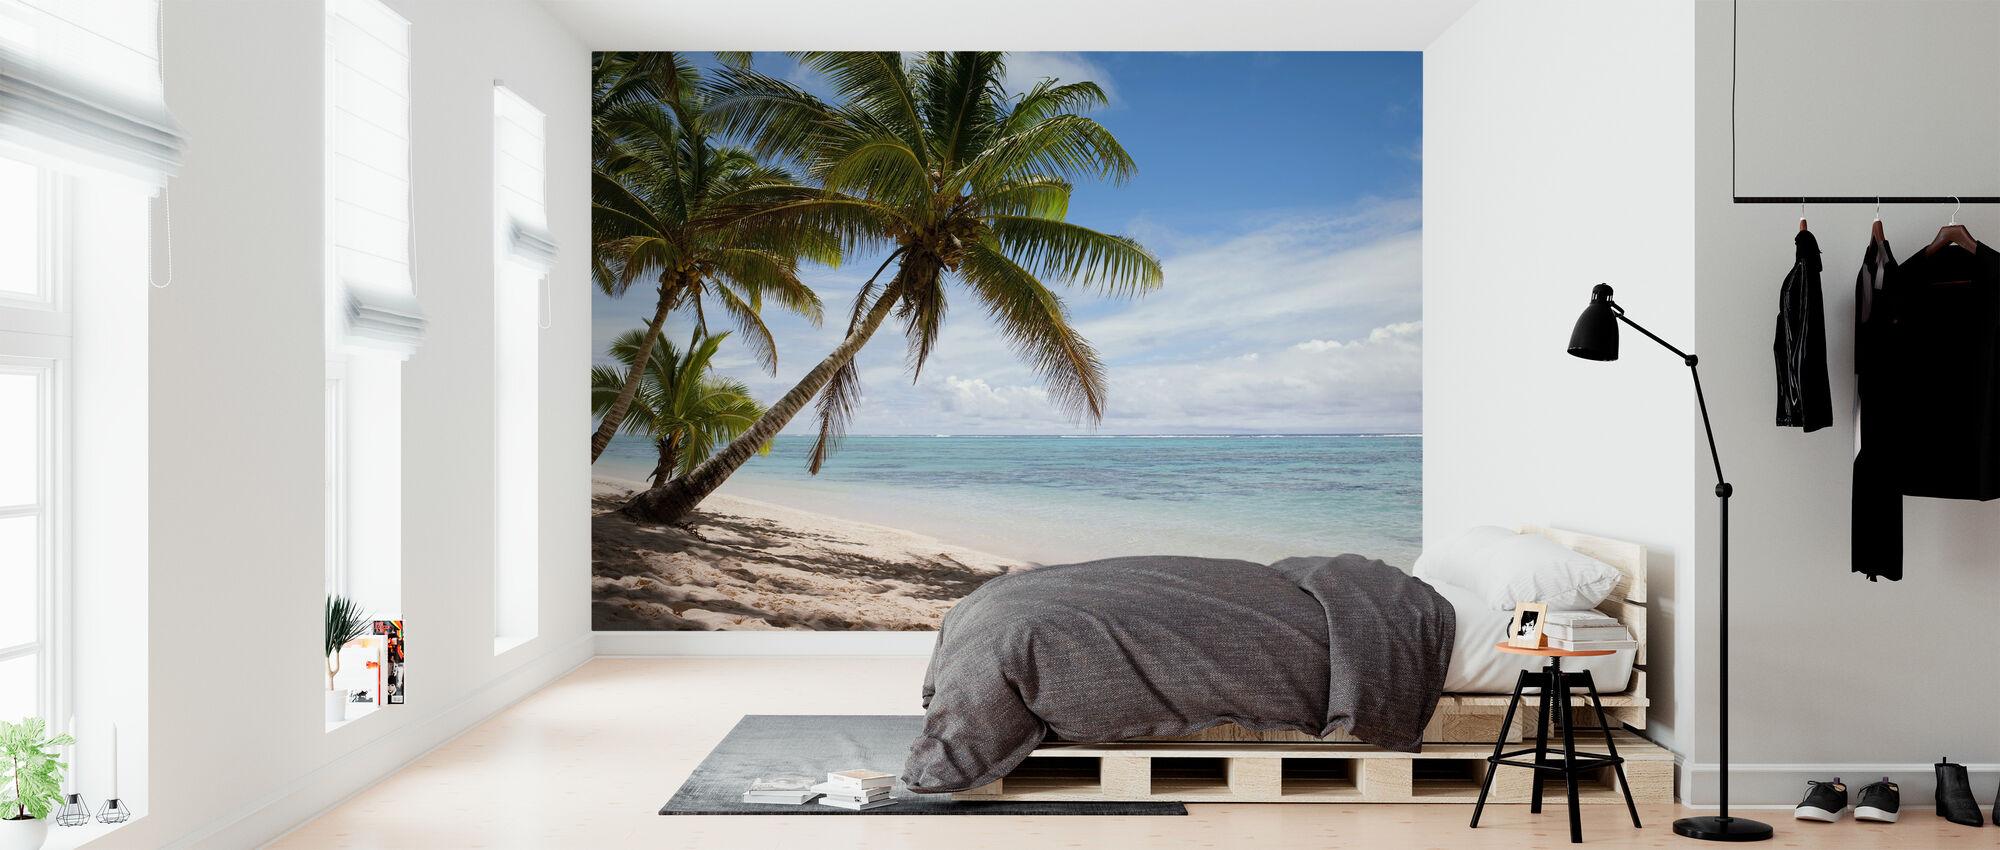 Tropical Beach Scene - Wallpaper - Bedroom